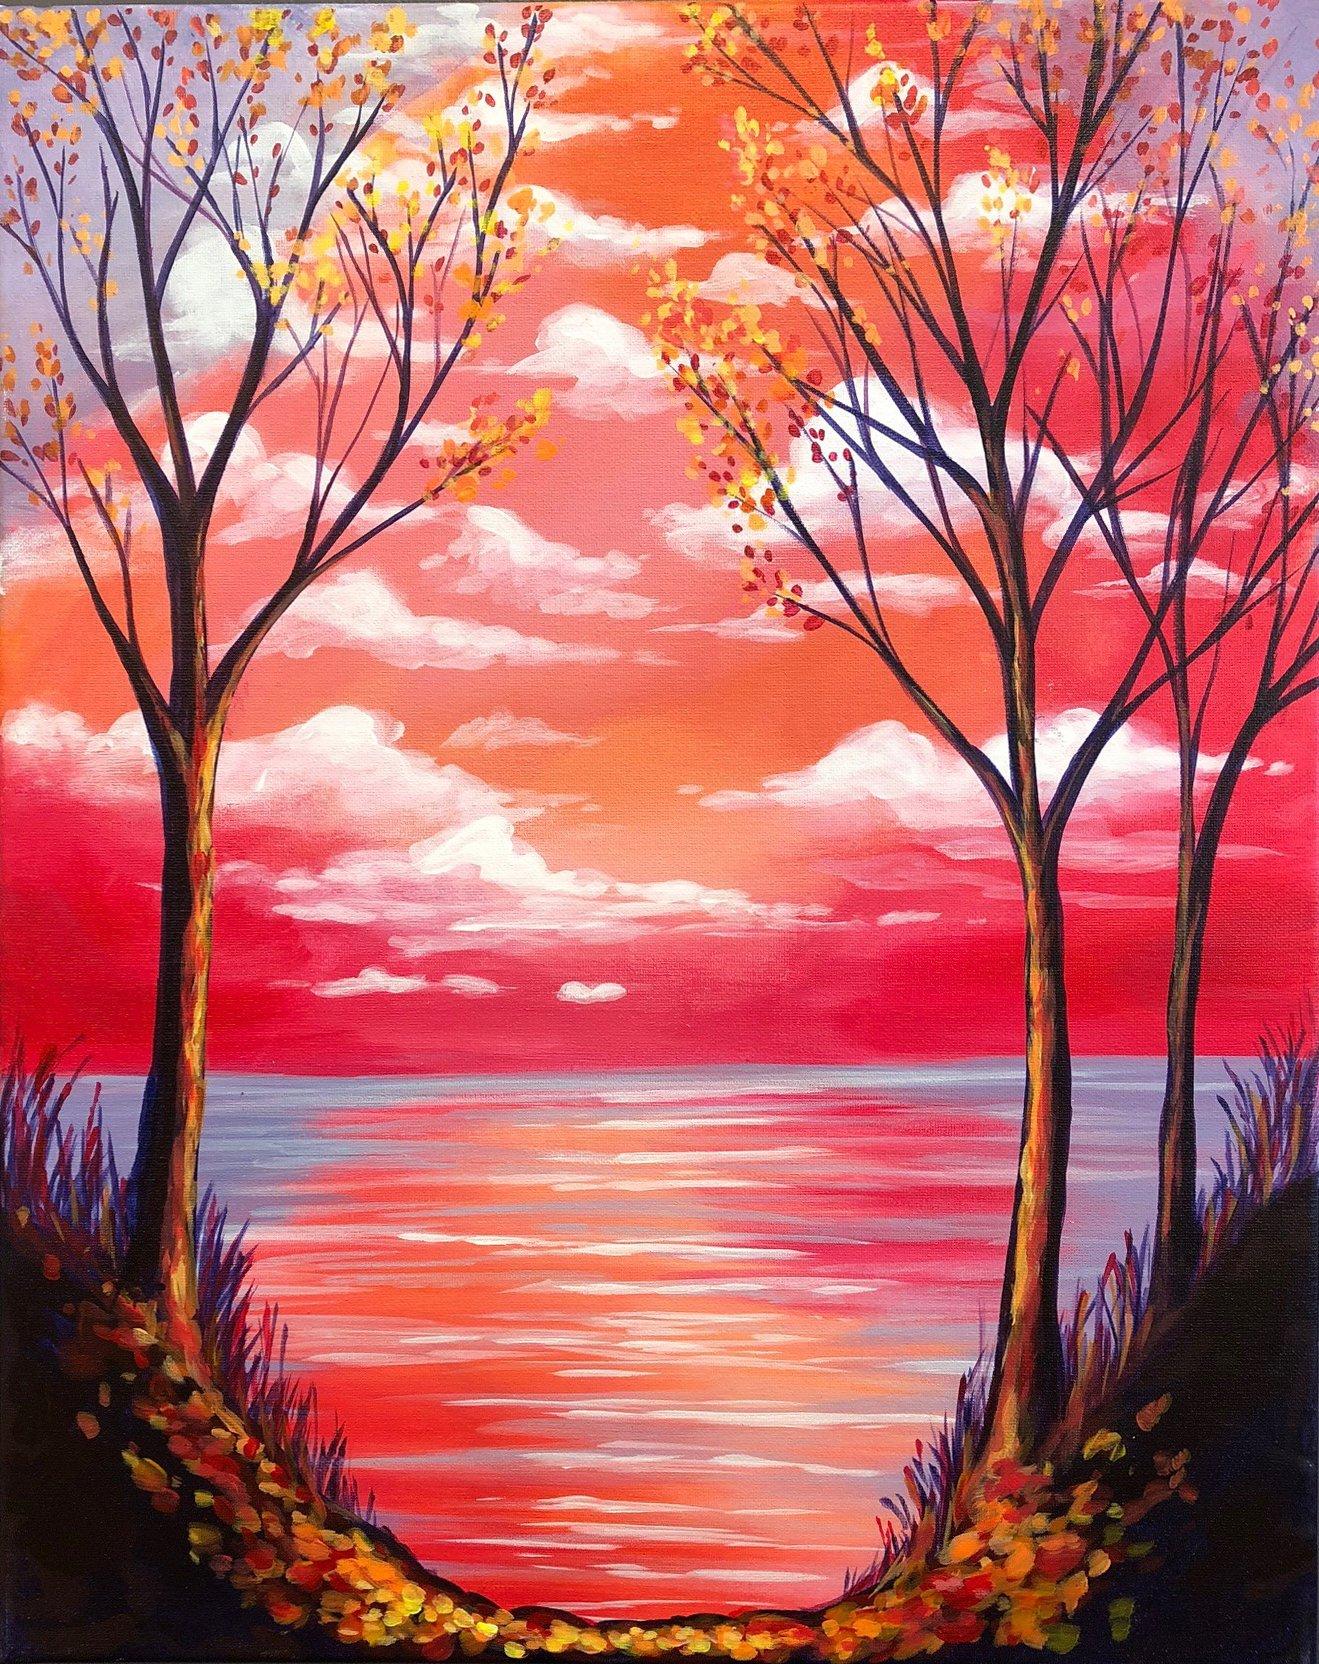 rose-autumn-morning